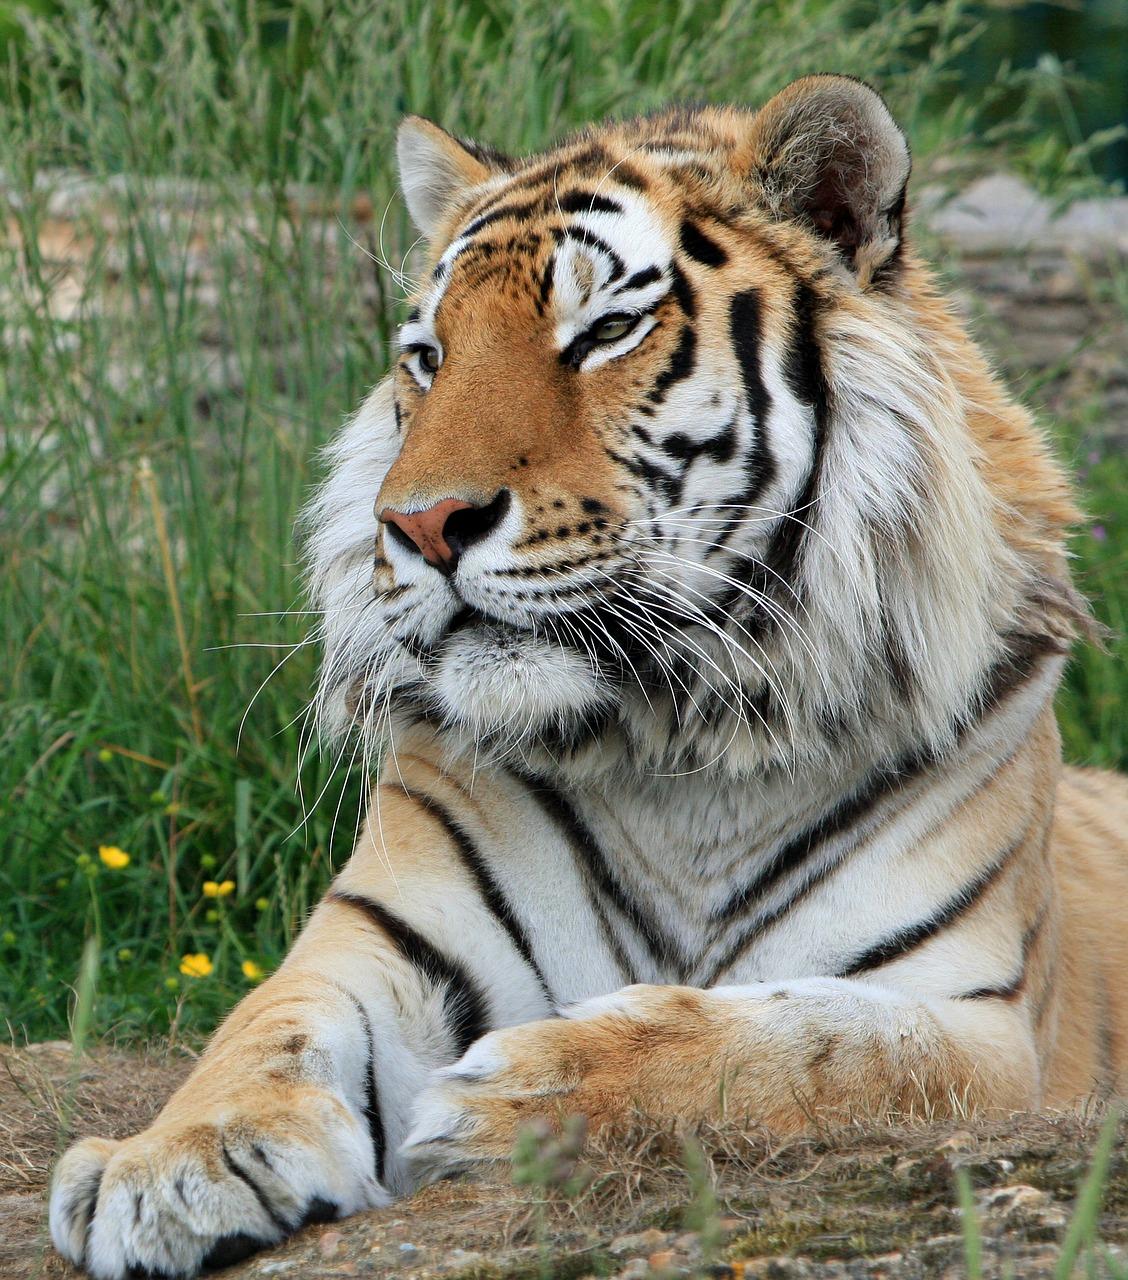 sibirsky tiger jedla olej